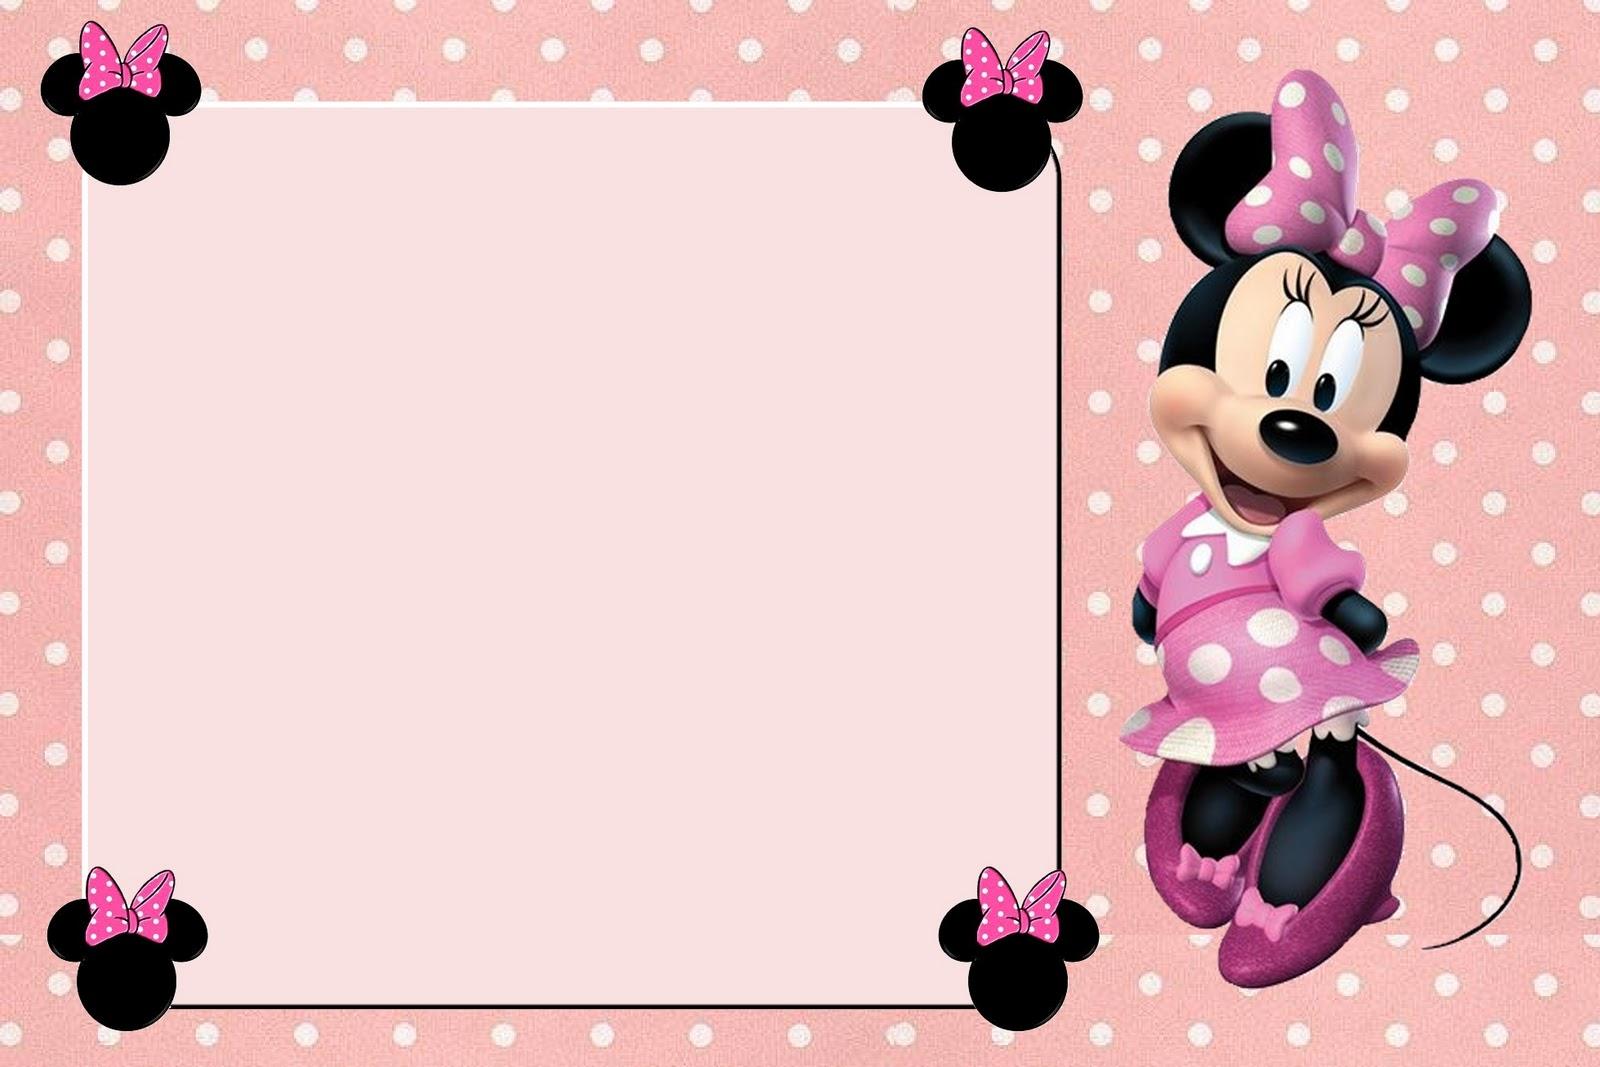 16 Ideas decorativas navideñas con temática de Mickey Mouse